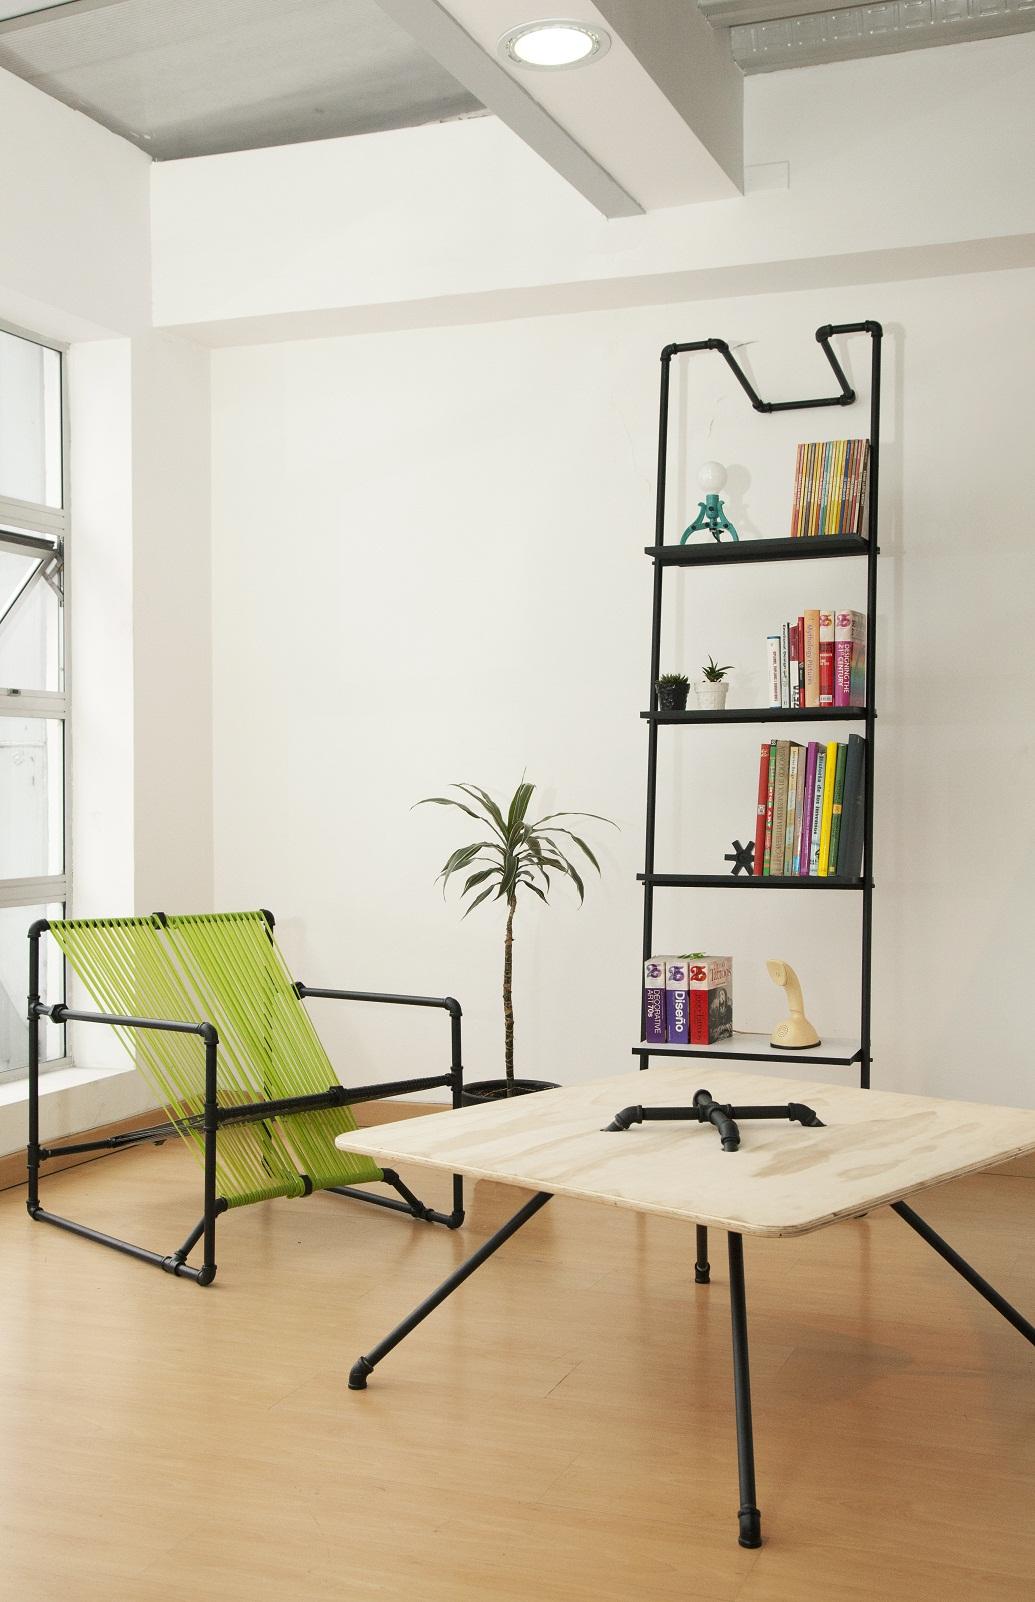 The Open Tap by Dosuno design stol kreslo polica z mosadznych rur